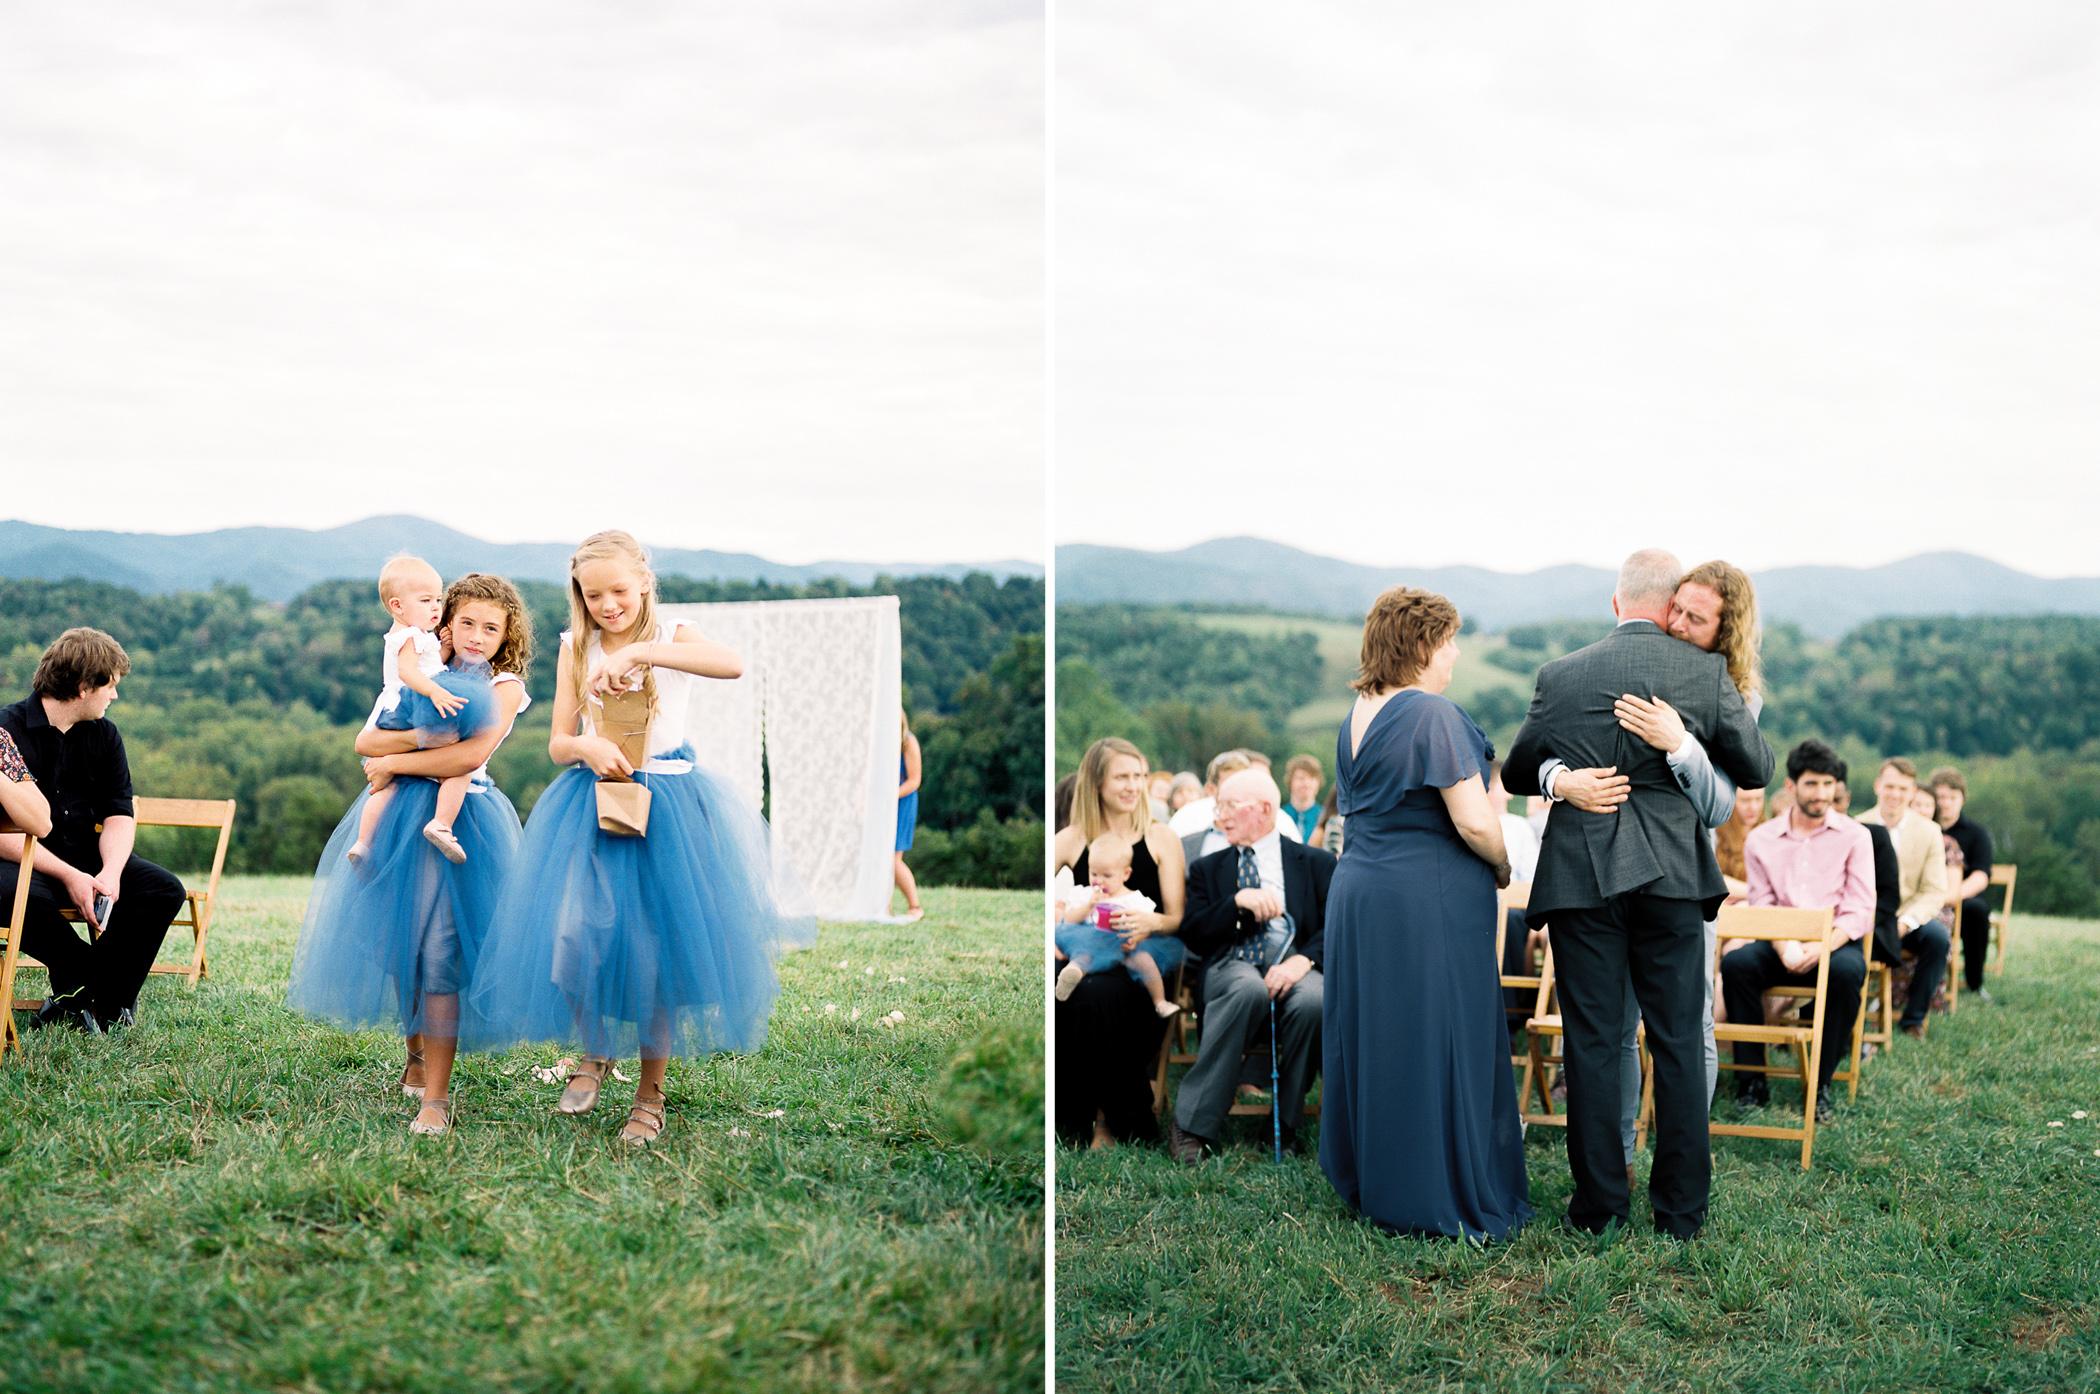 Charlotte-Film-Wedding_Photographer-heartstone-lodge-virginia-17.jpg